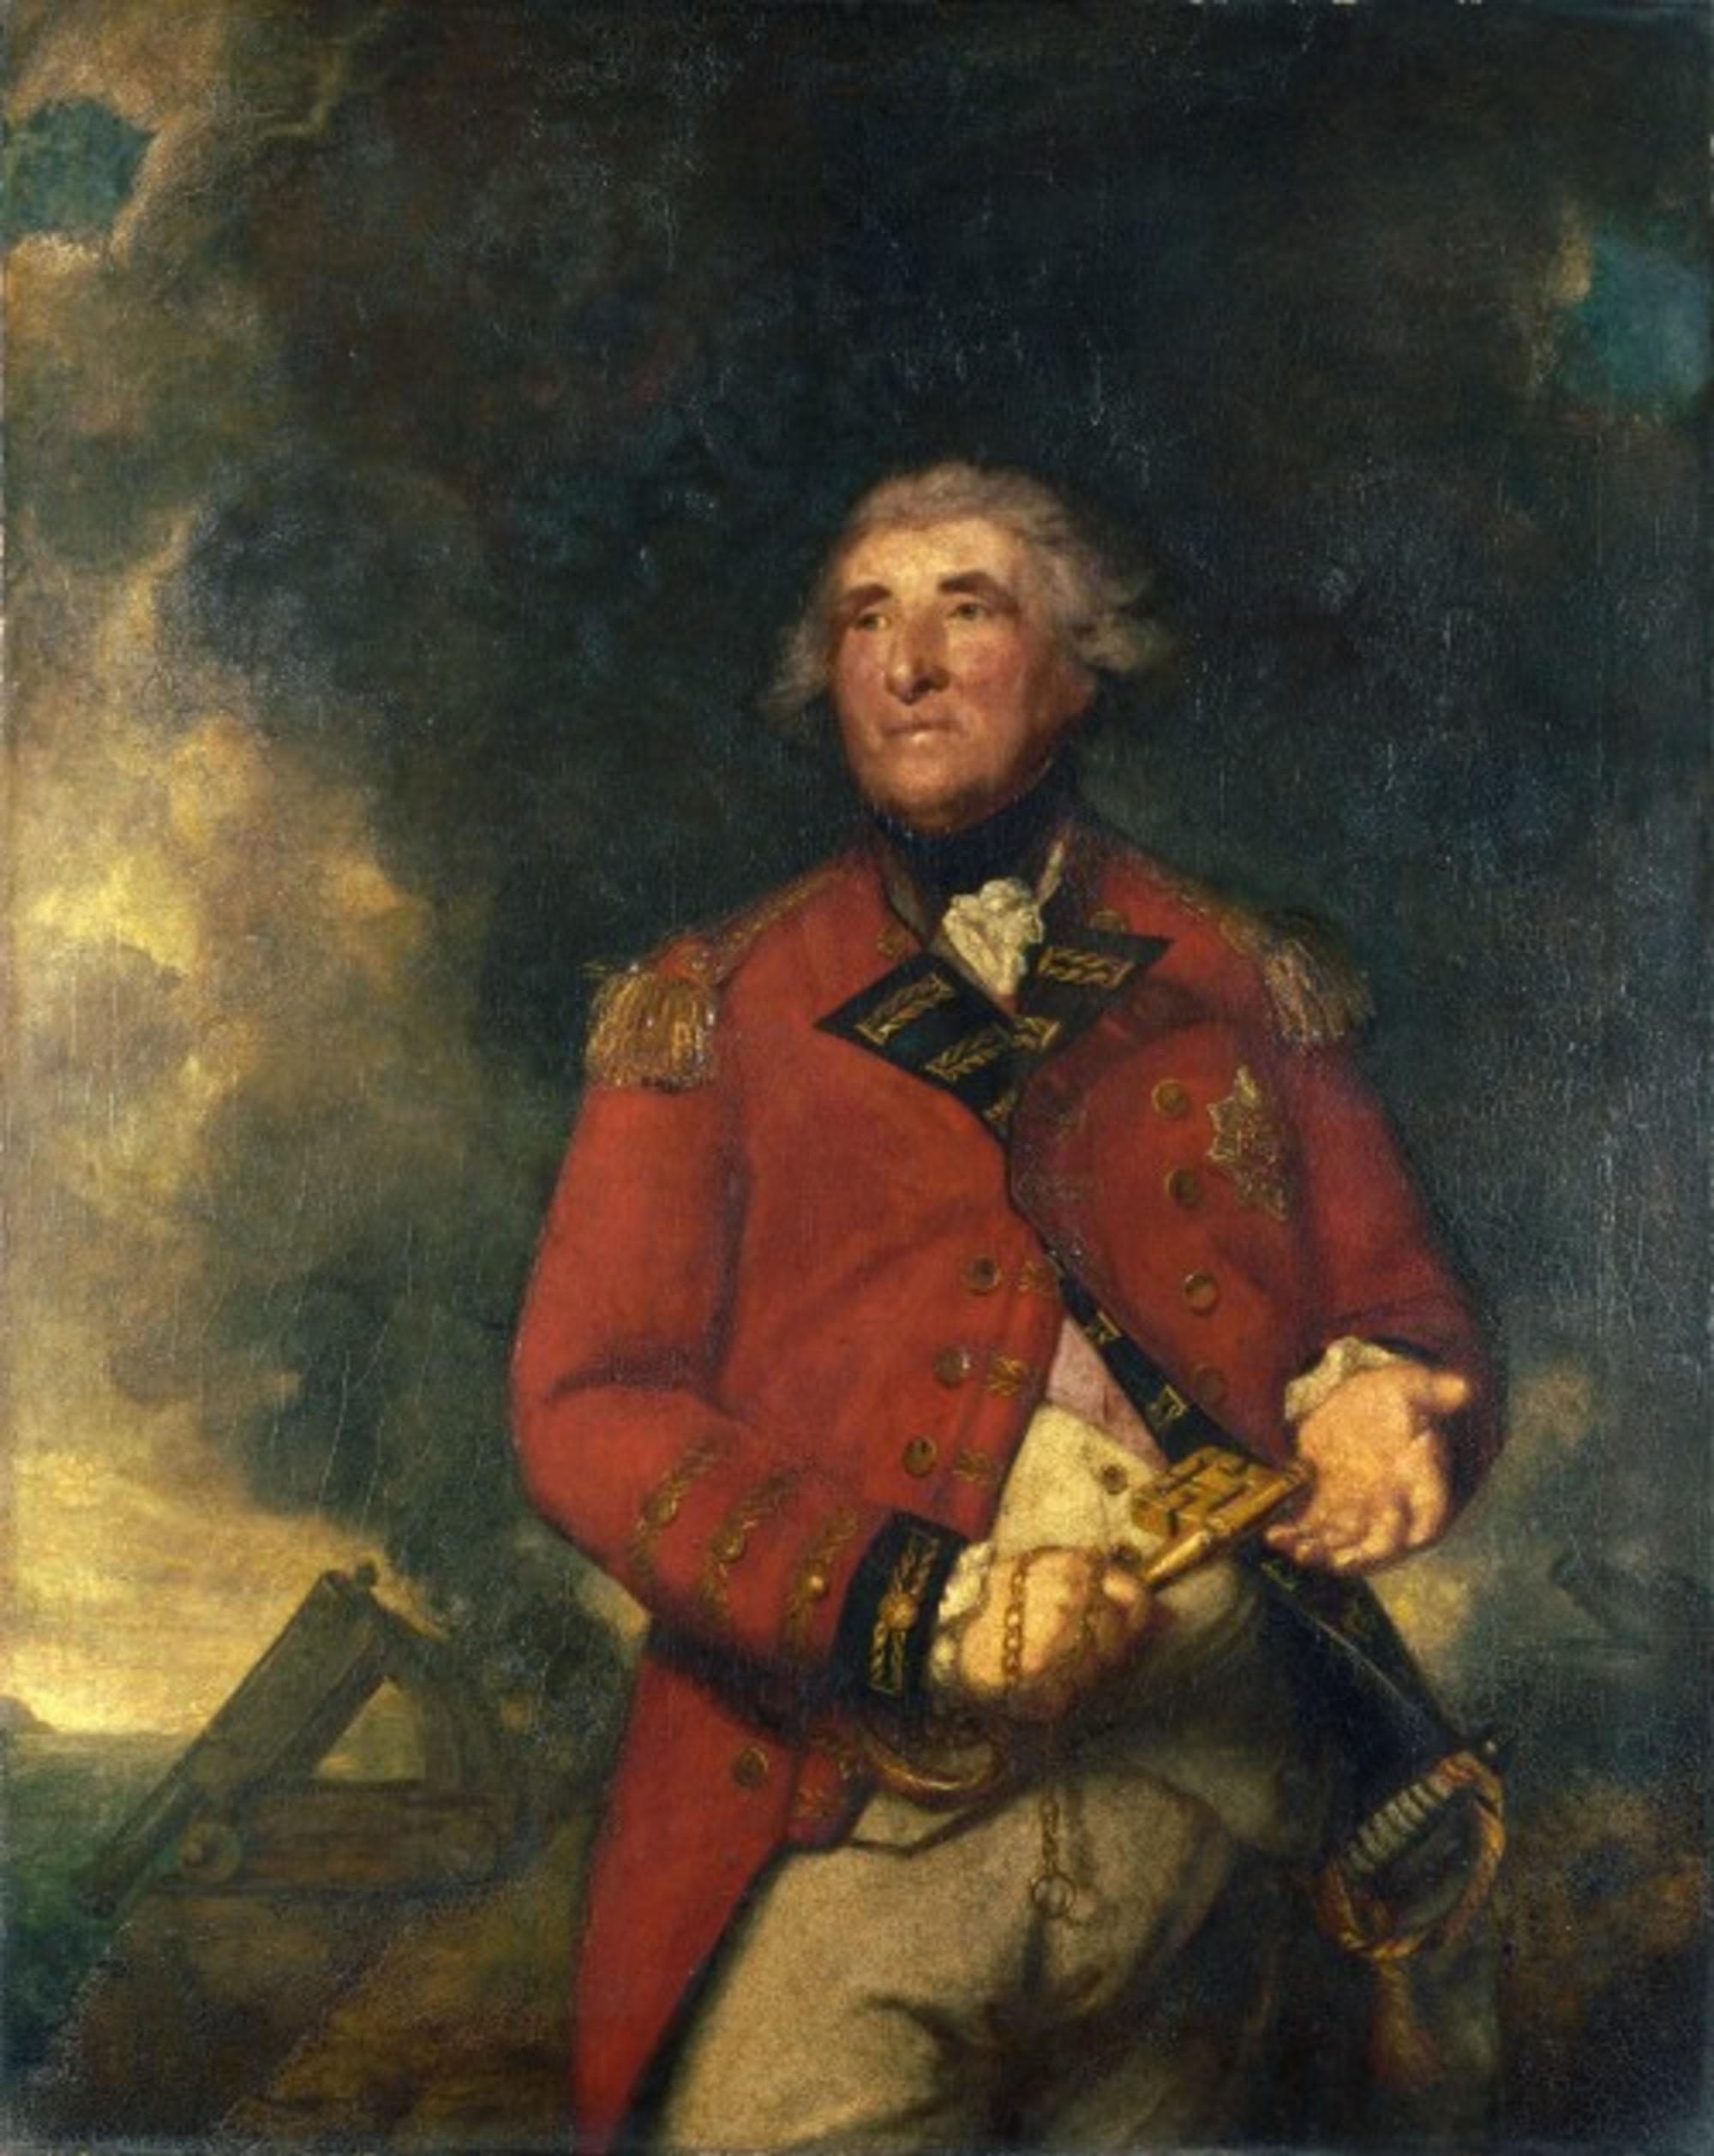 George_Augustus_Eliott_1st_Baron_Heathfield_-_by_Joshua_Reynolds_-_Project_Gutenberg_eText_19009.jpg